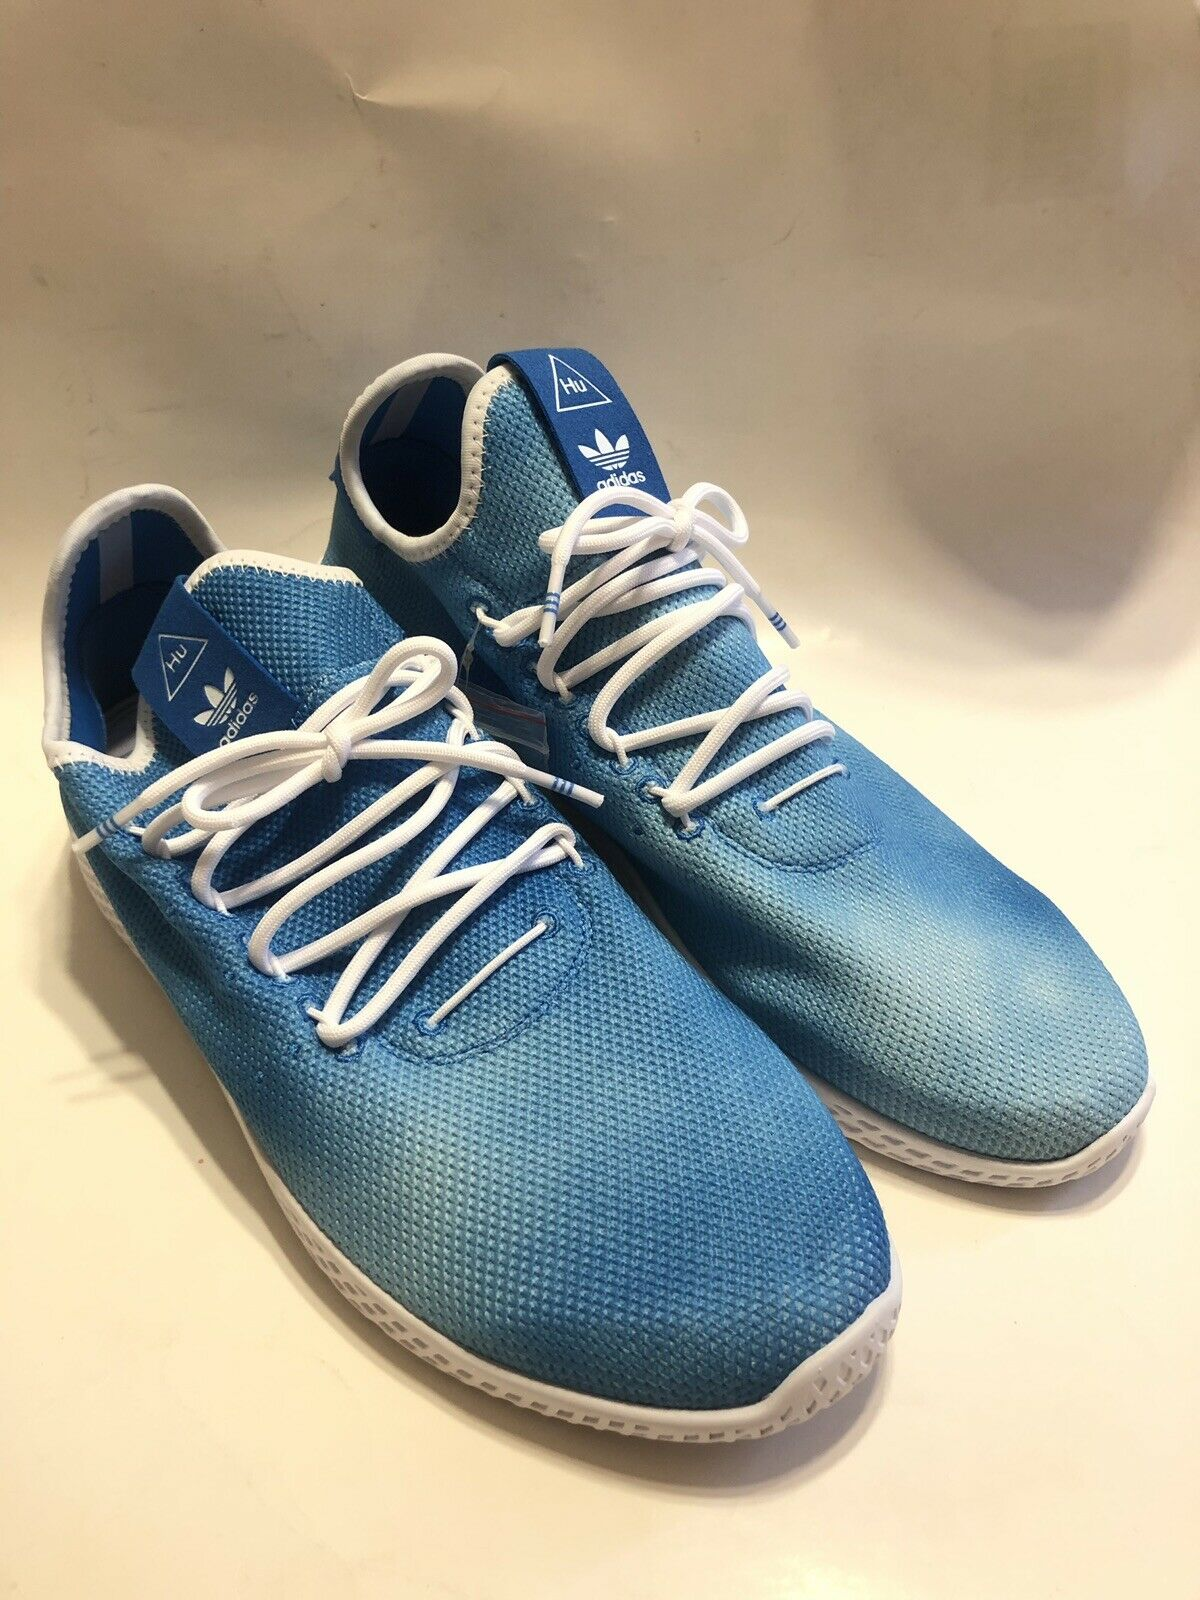 New Men's Adidas Pharrell Williams Holi Tennis Hu shoes Sneaker DA9618 Size 11